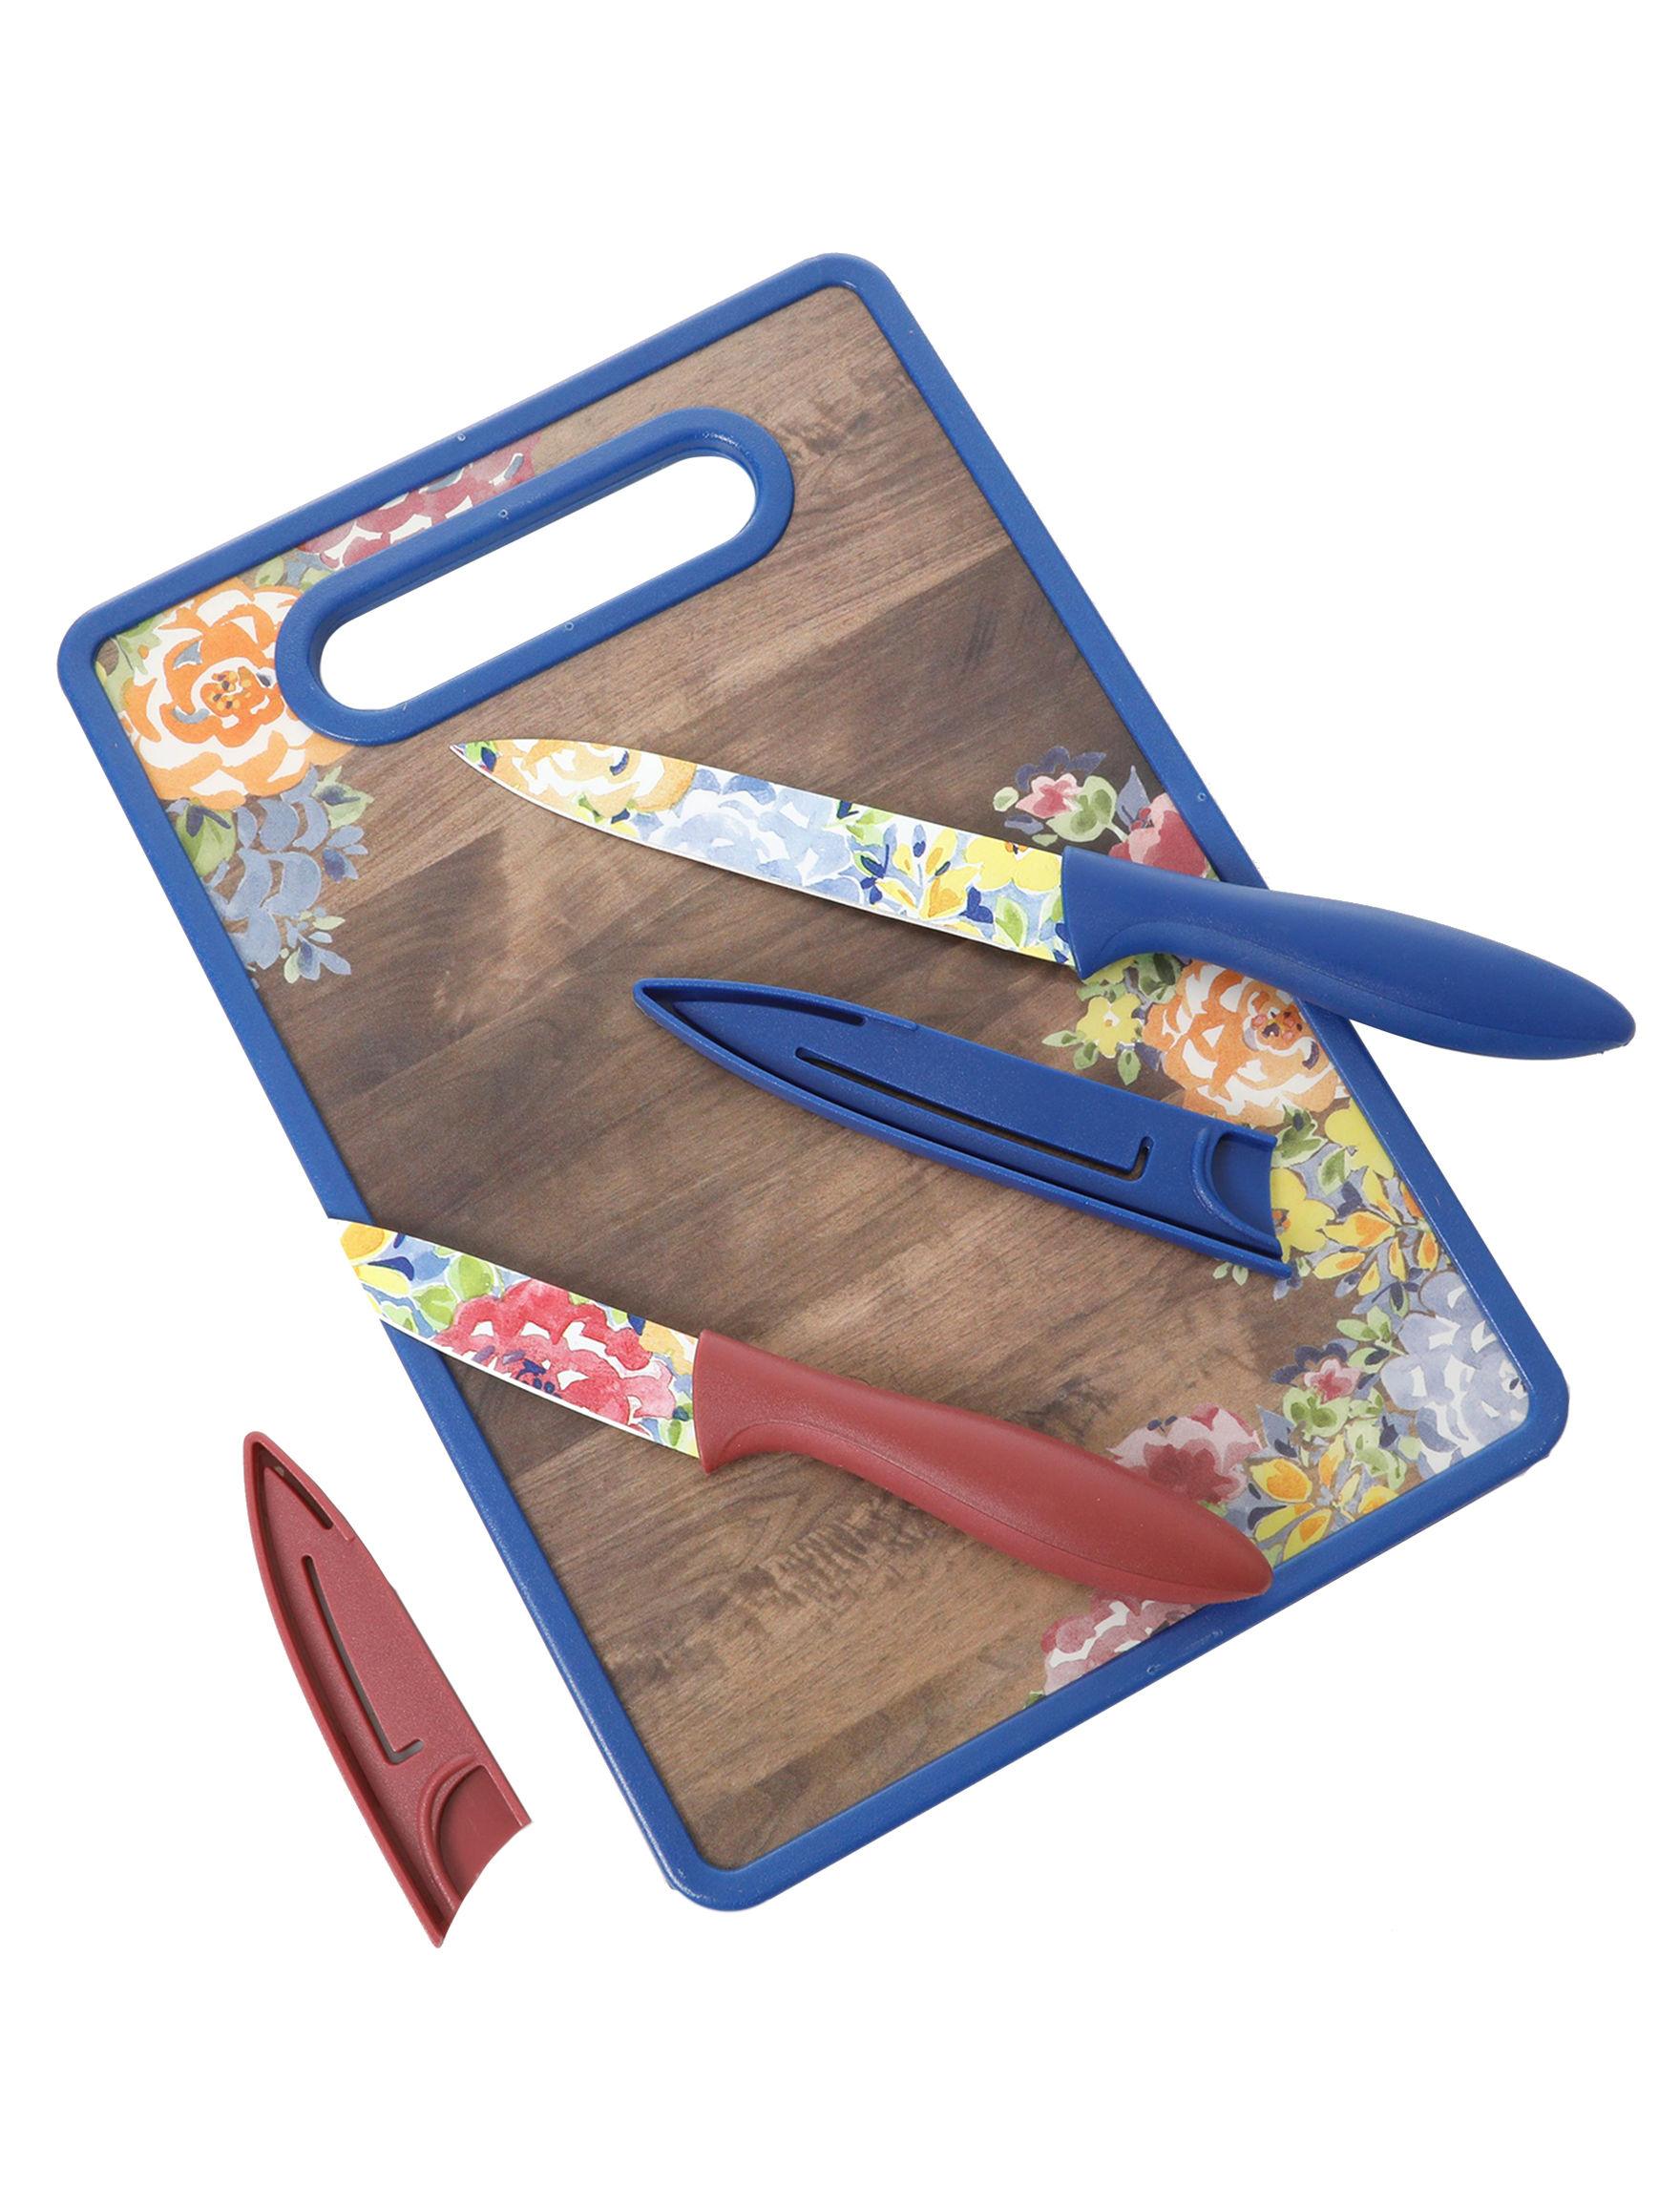 Studio California  Cutting Boards Knives & Cutlery Prep & Tools